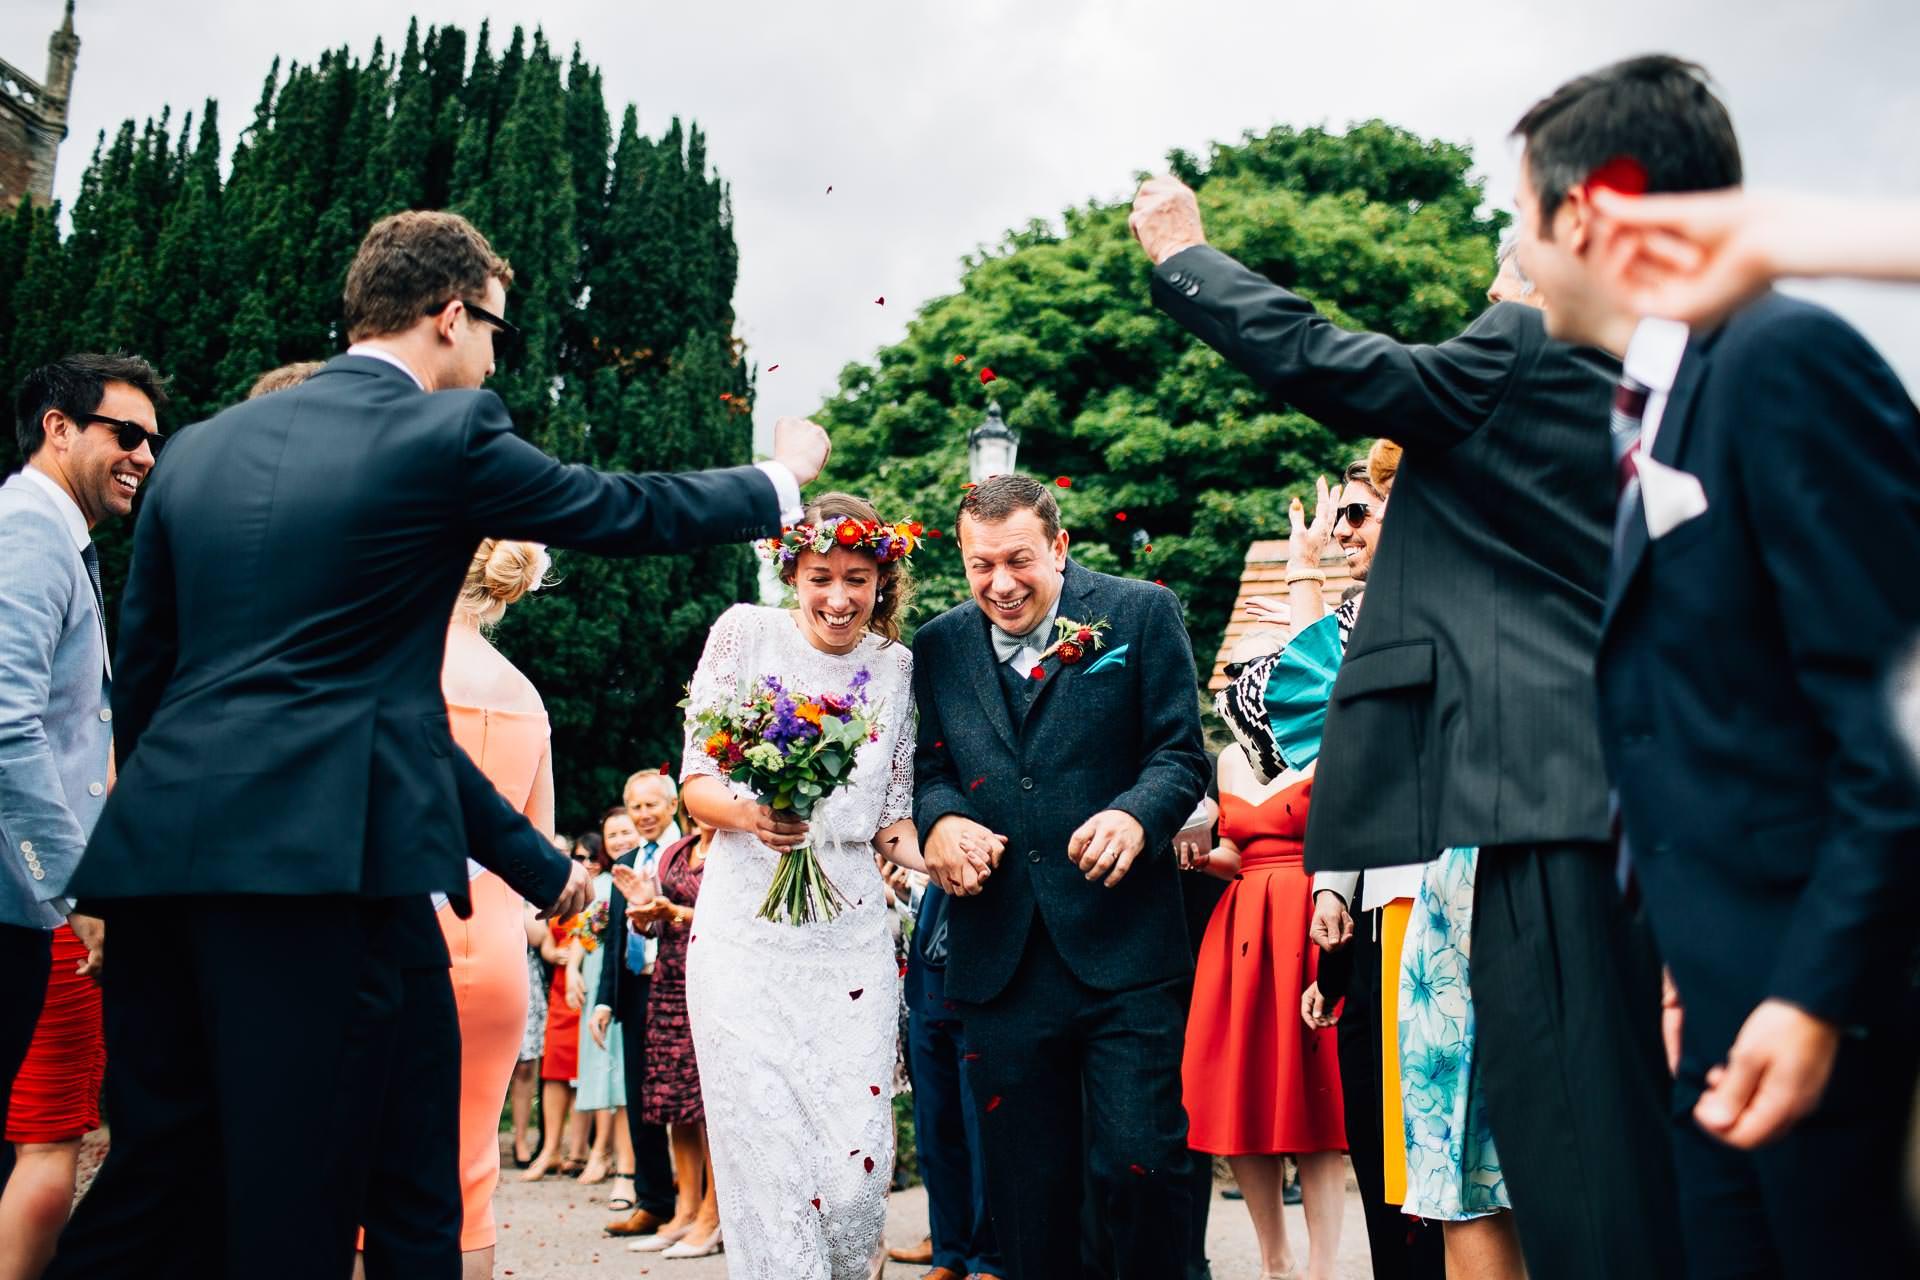 winterbourne-medieval-barn-wedding-photography-emma-andrew-65